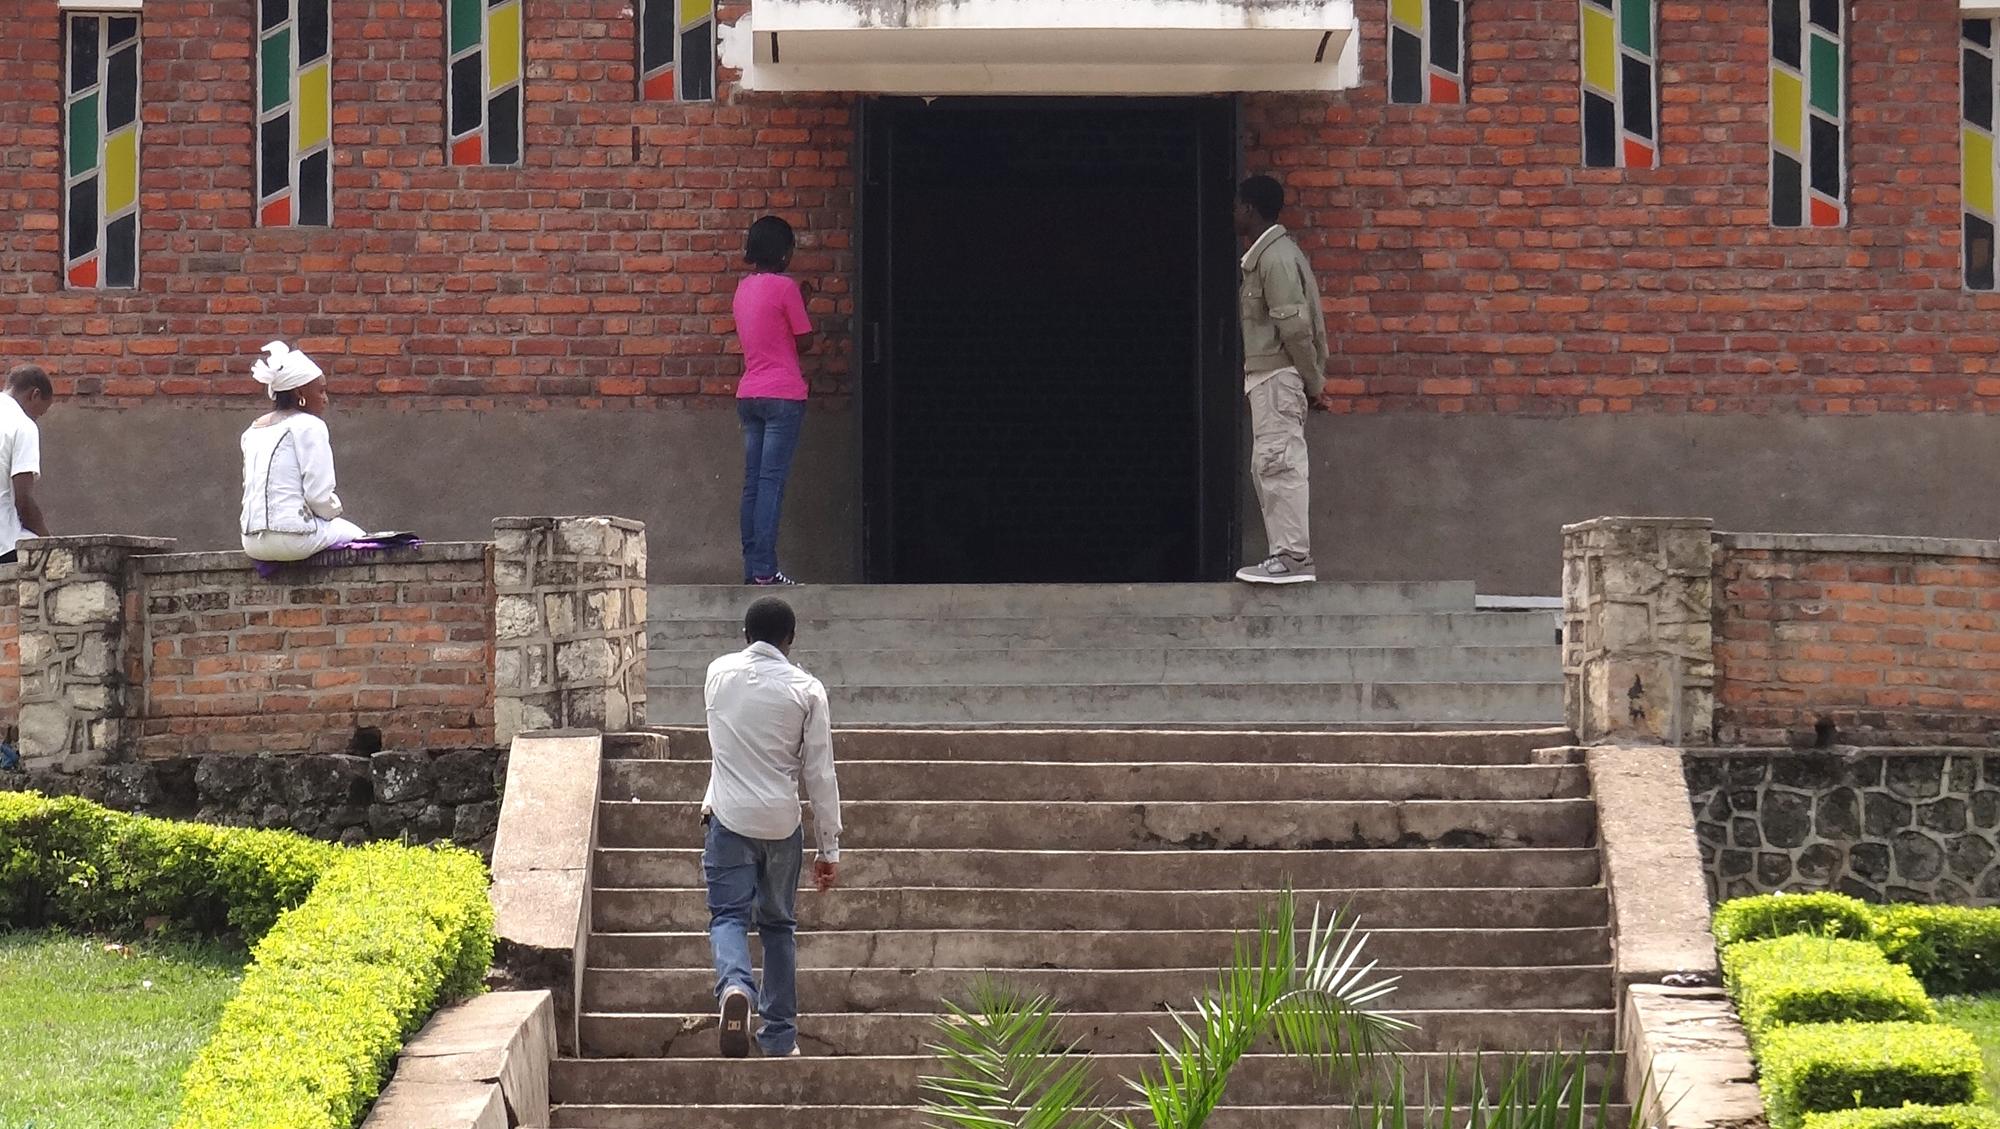 Rwanda Restricts Fasting as 8,000 Churches Closed         News